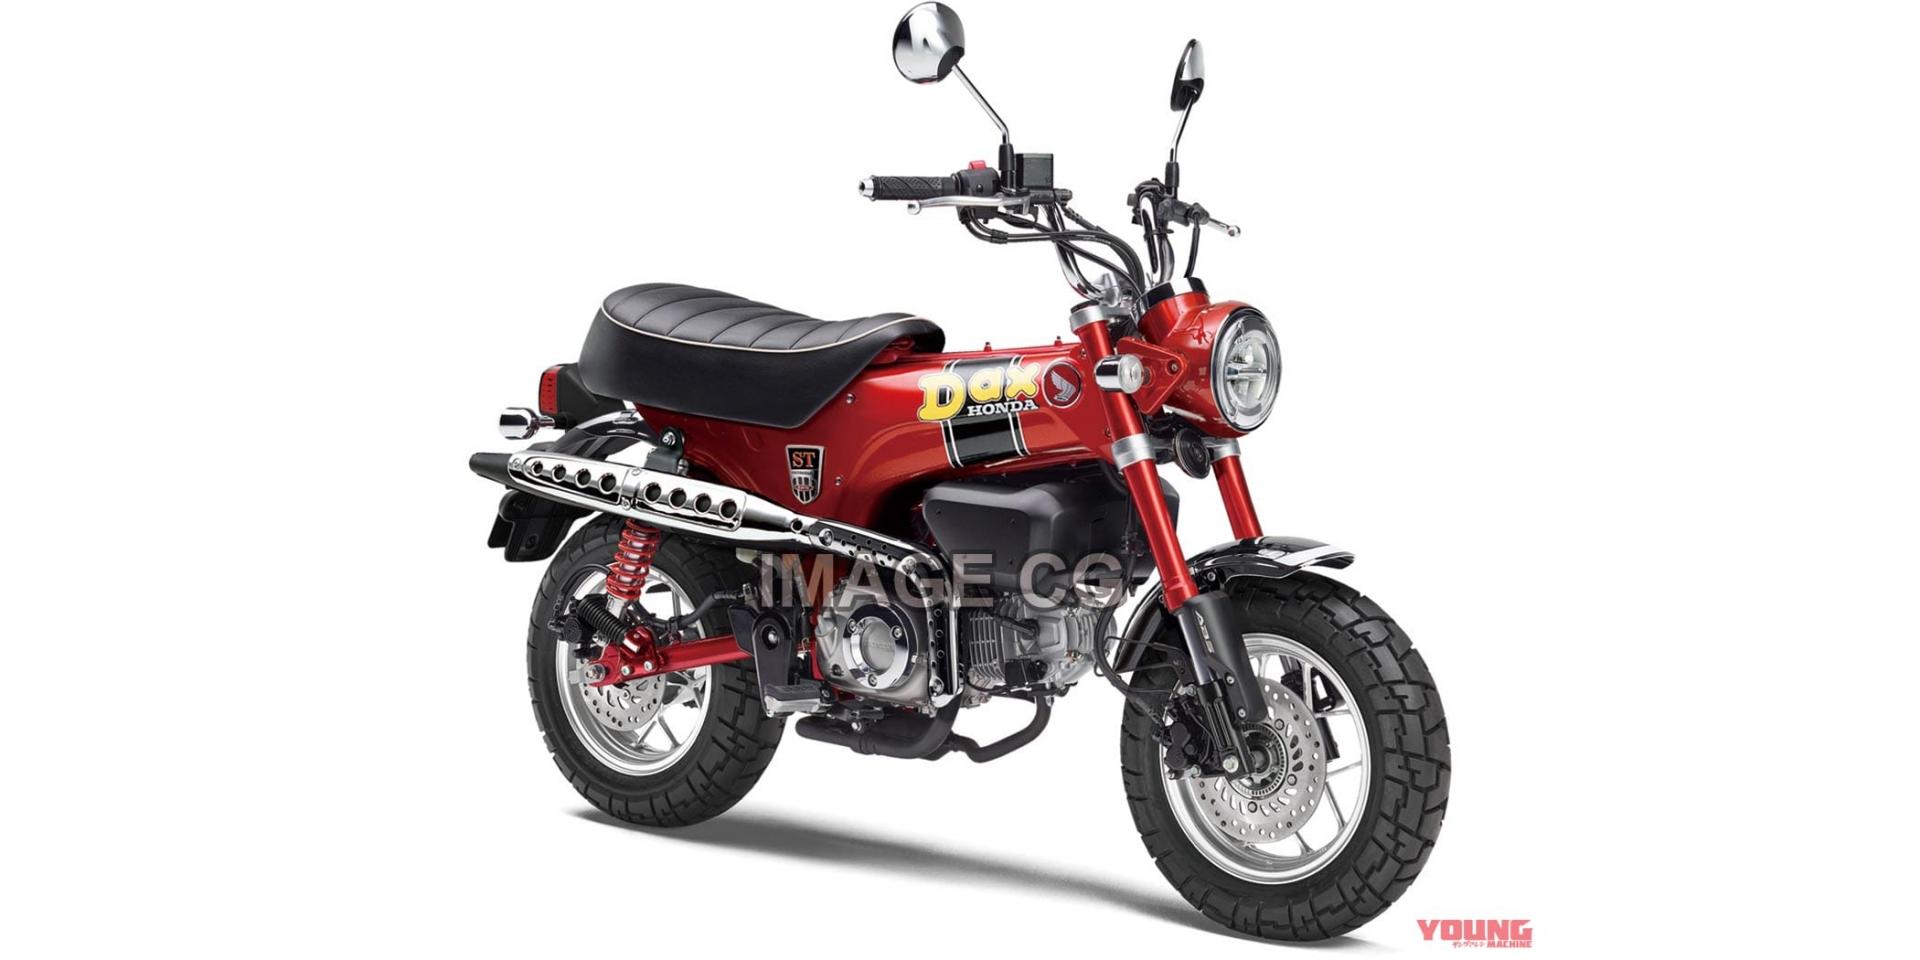 HONDA申請ST125商標專利,全新小車「DAX 125」明年登場?